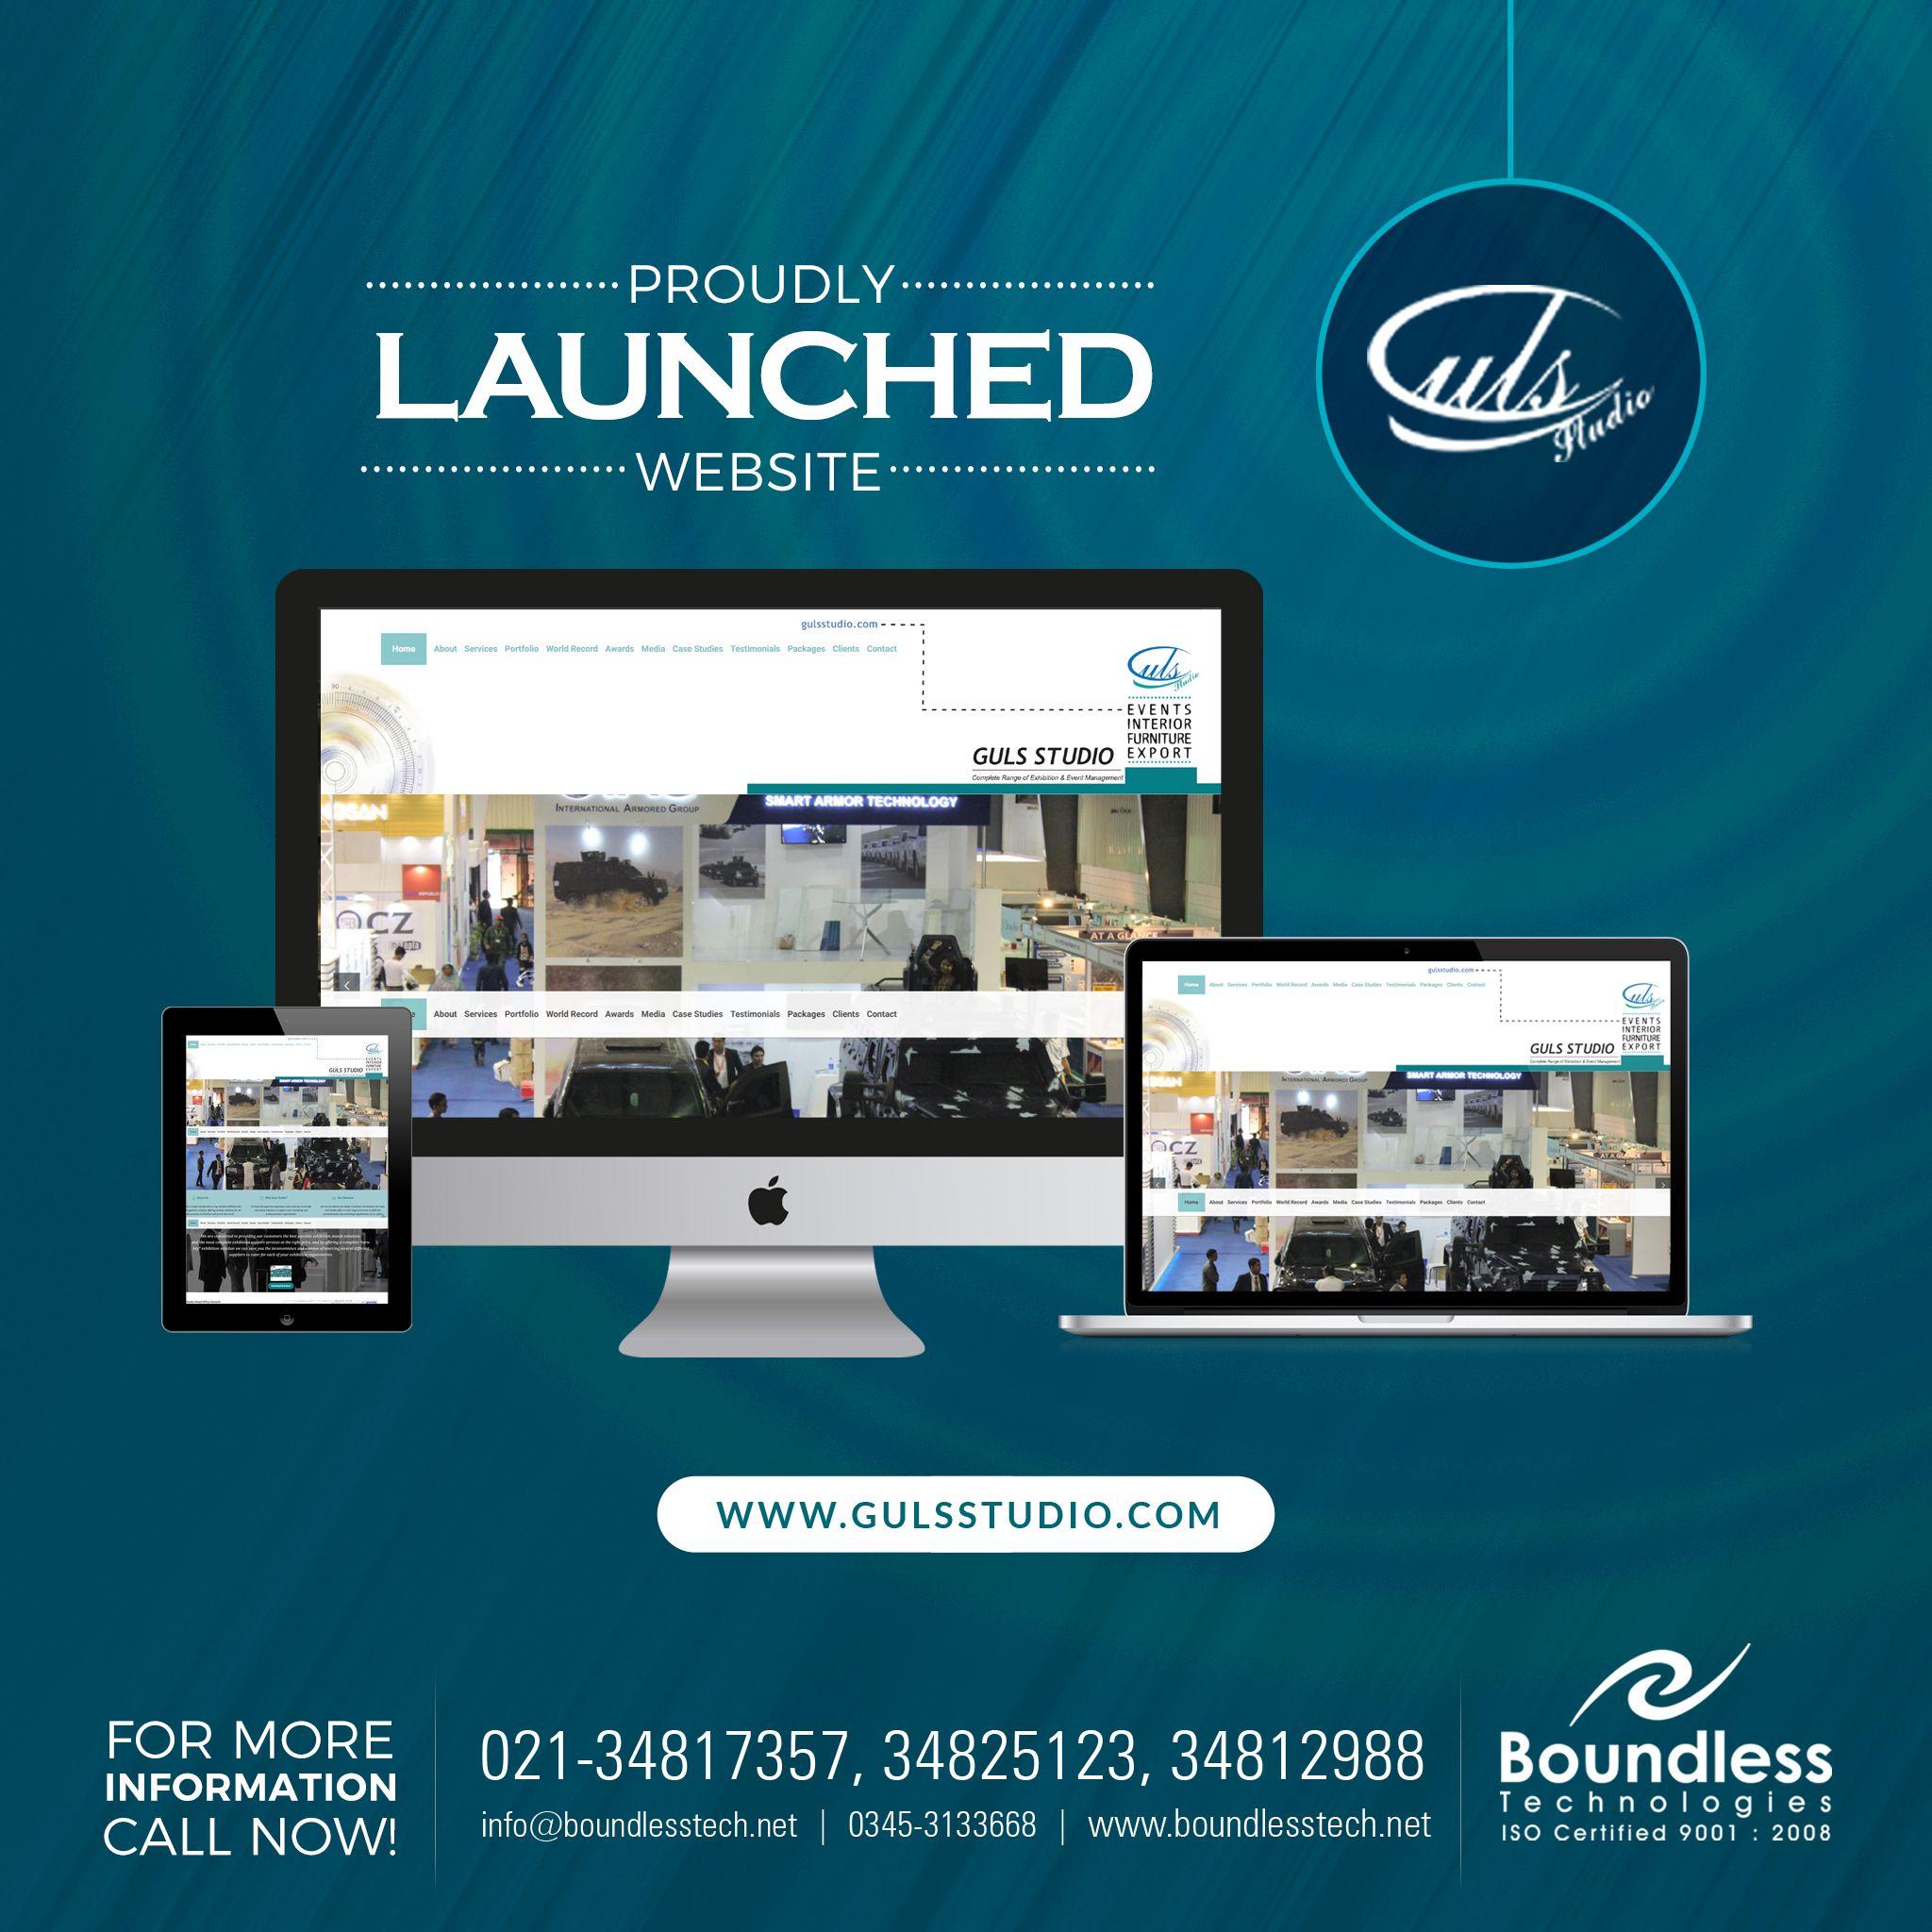 Vps Hosting Pakistan Virtual Private Server Karachi Website Design Website Design Services Content Management System